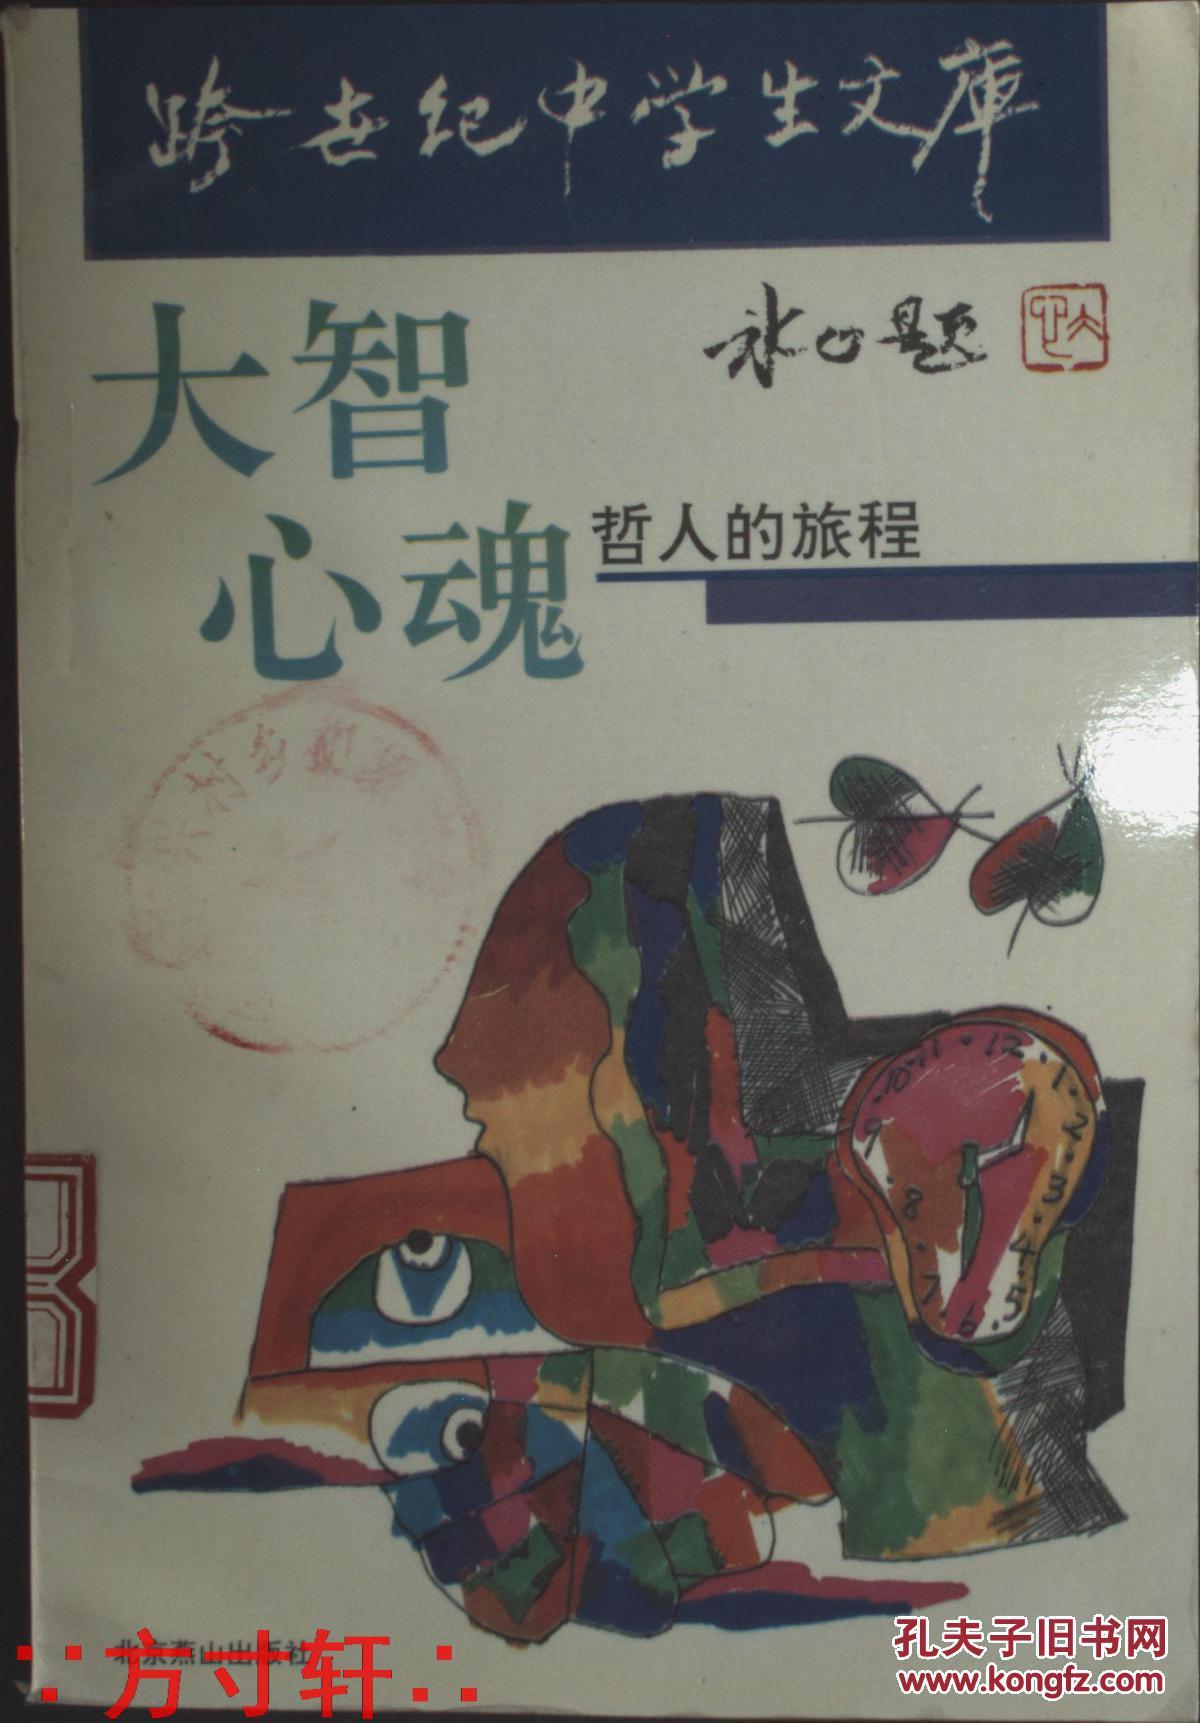 http://book.kongfz.com/134525/532586591/